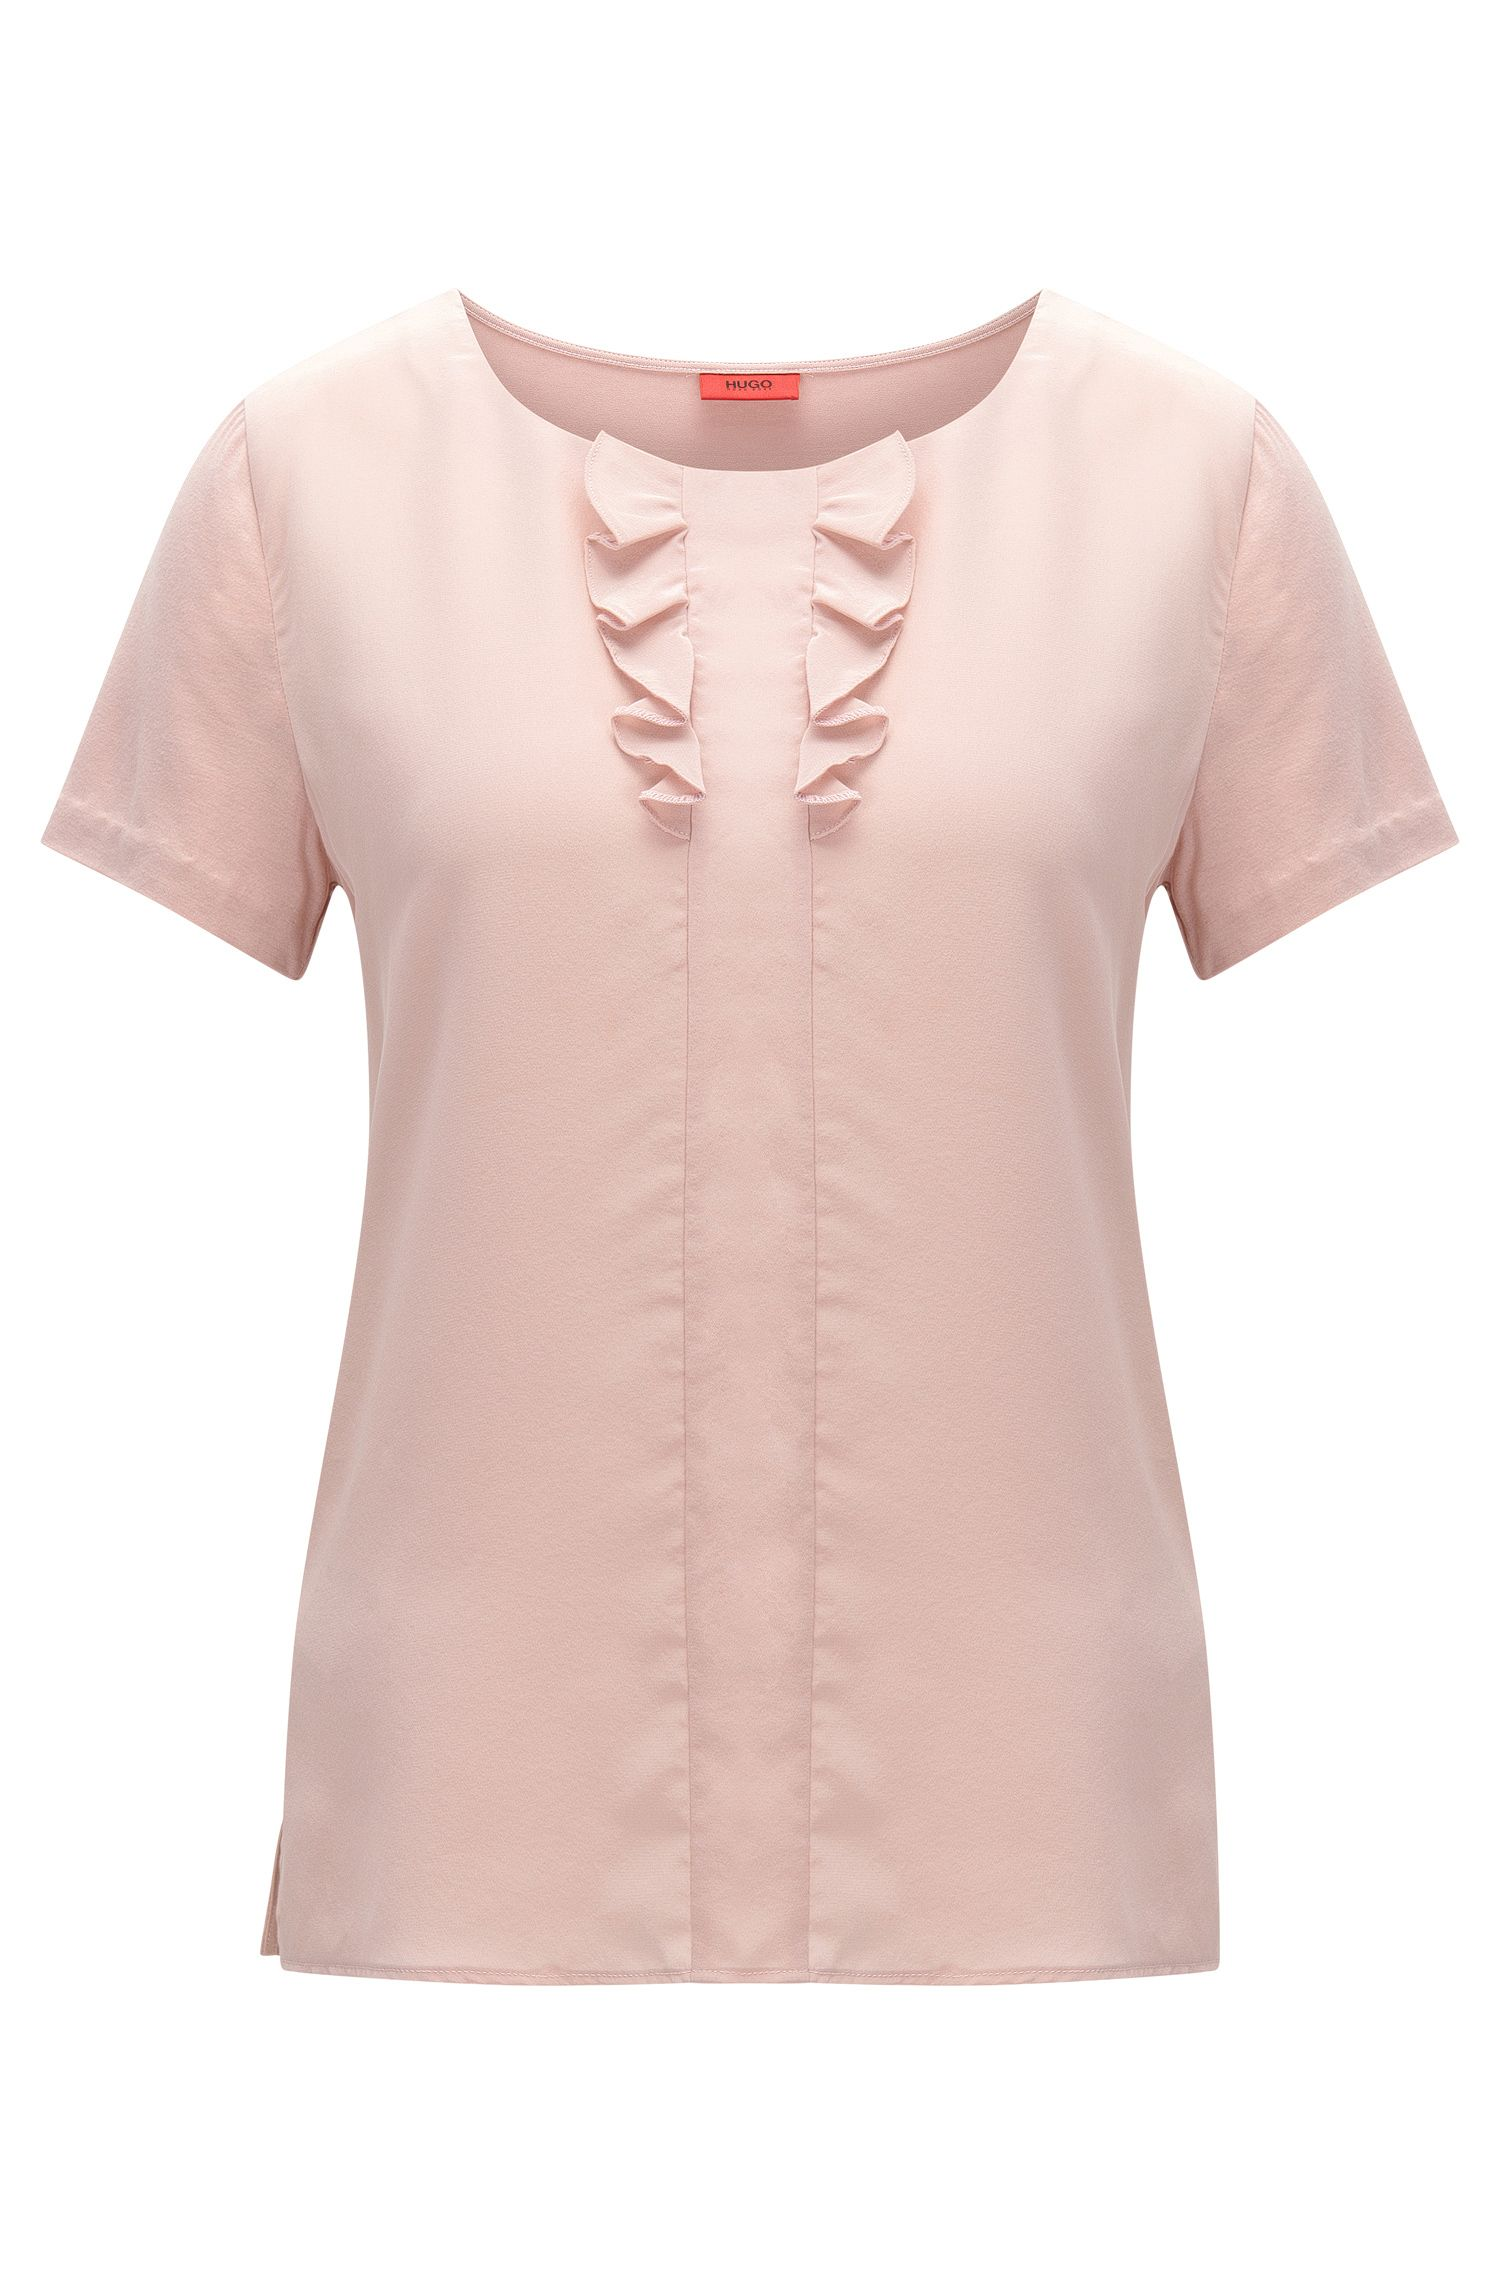 T-shirt relaxed fit con dettaglio in seta